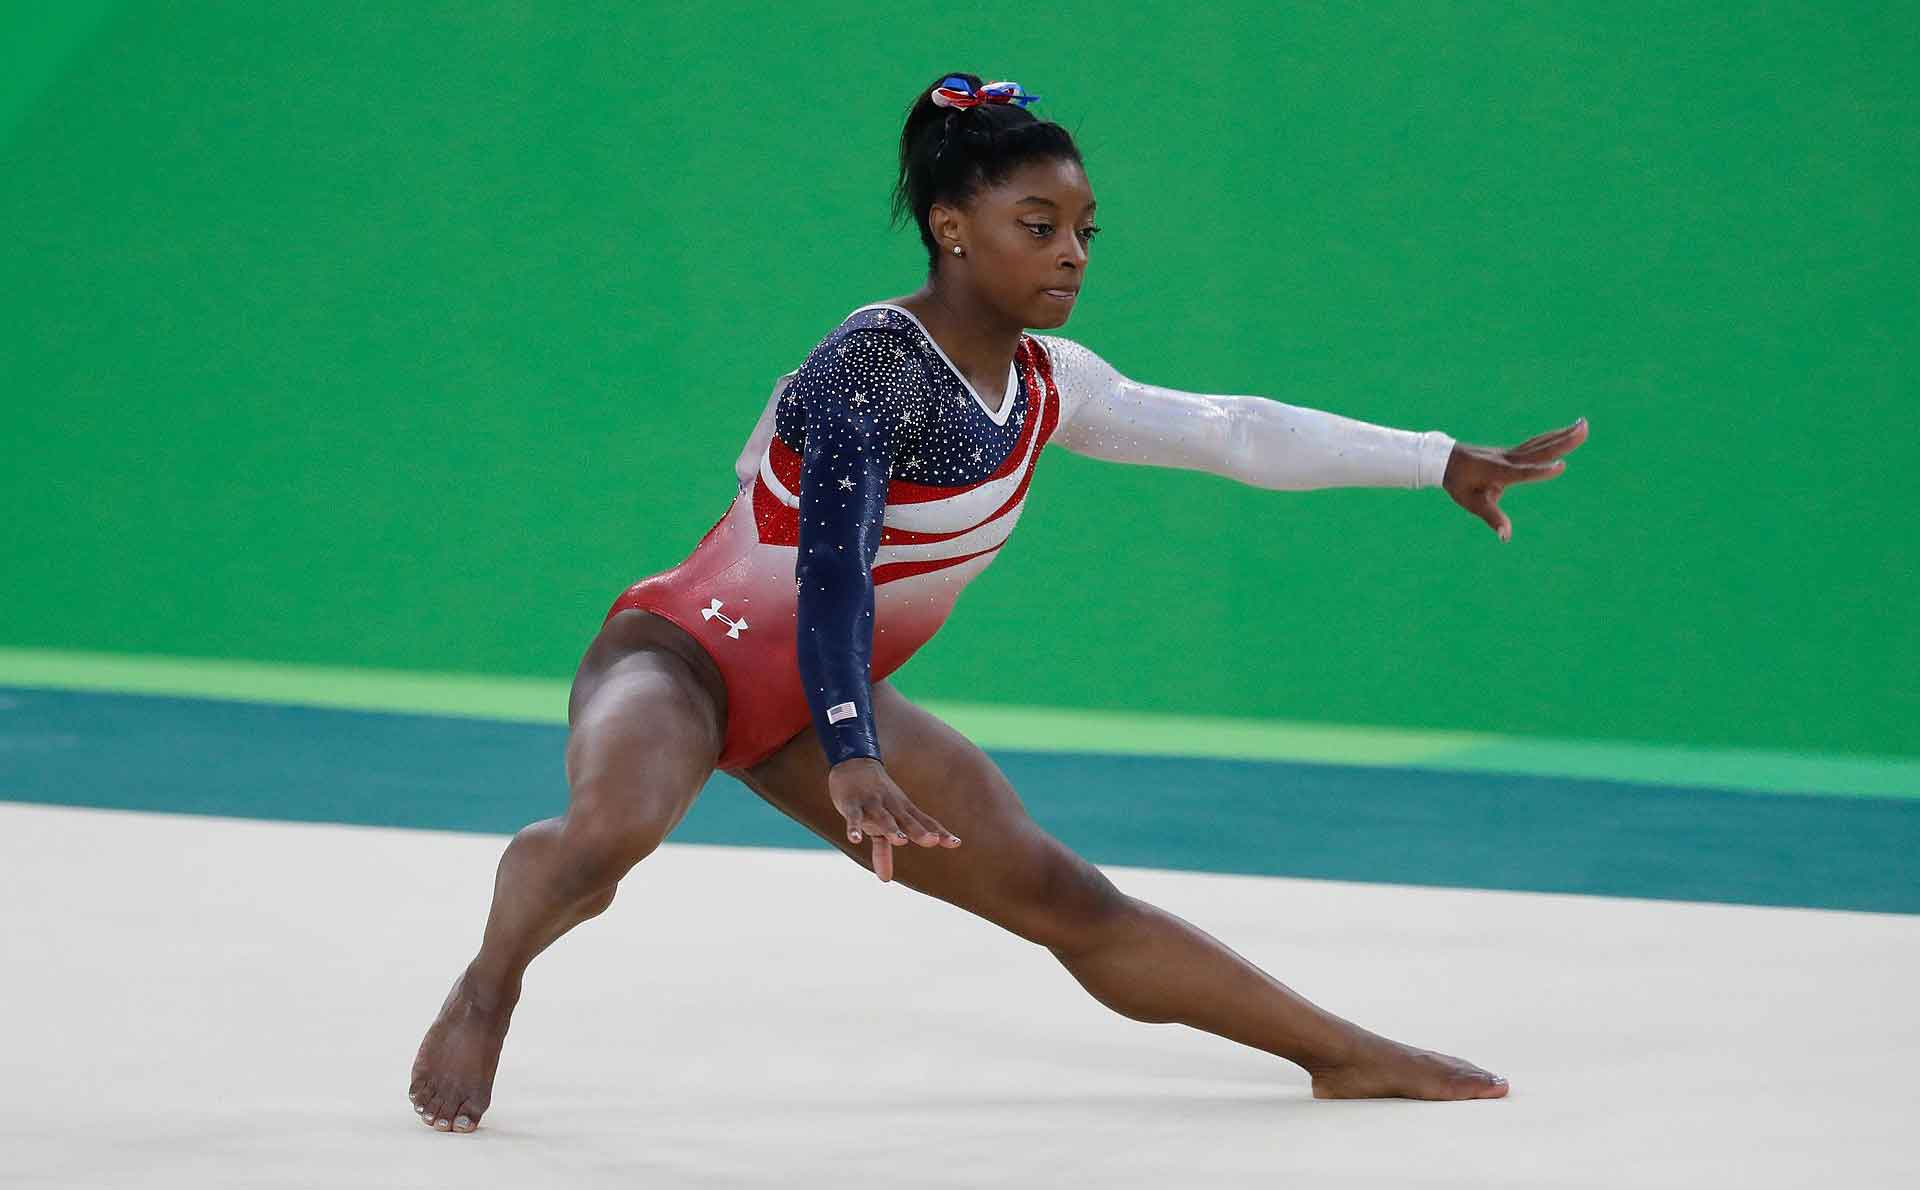 female athlete Simon Biles Olympic Gold Medal Gymnast